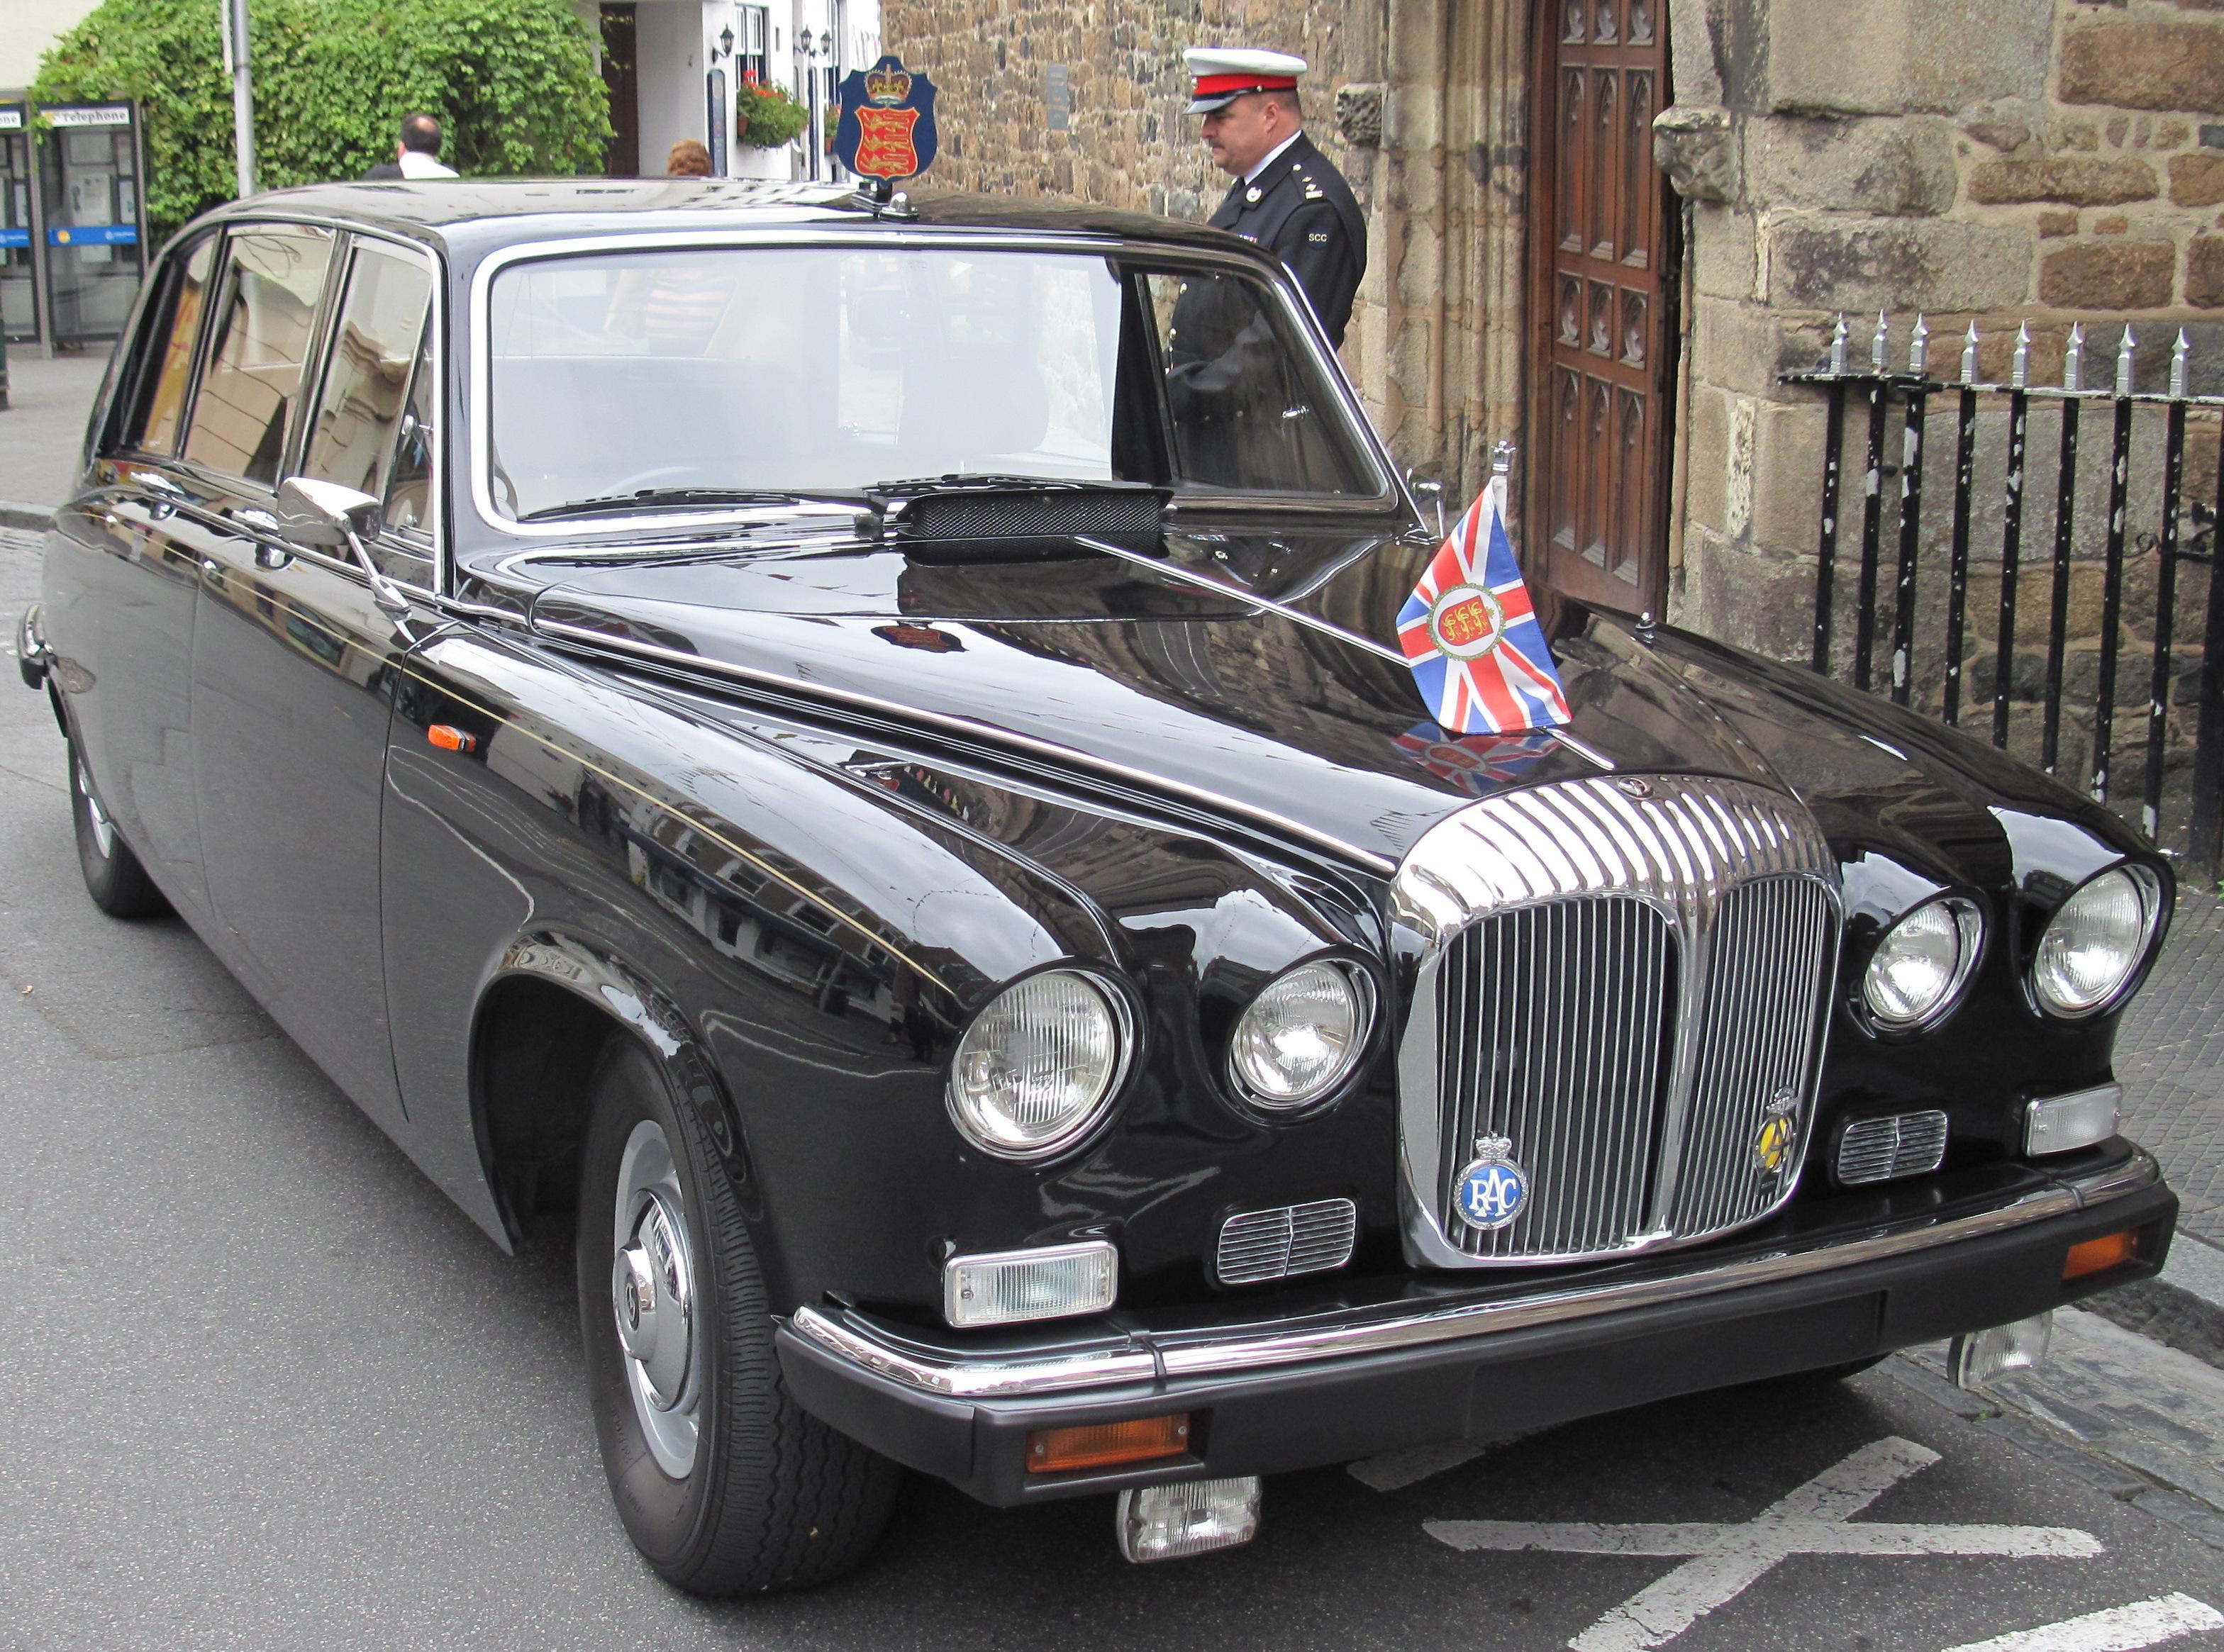 File Lieutenant Governor Of Guernsey Car Saint Peter Port 2012 C Jpg